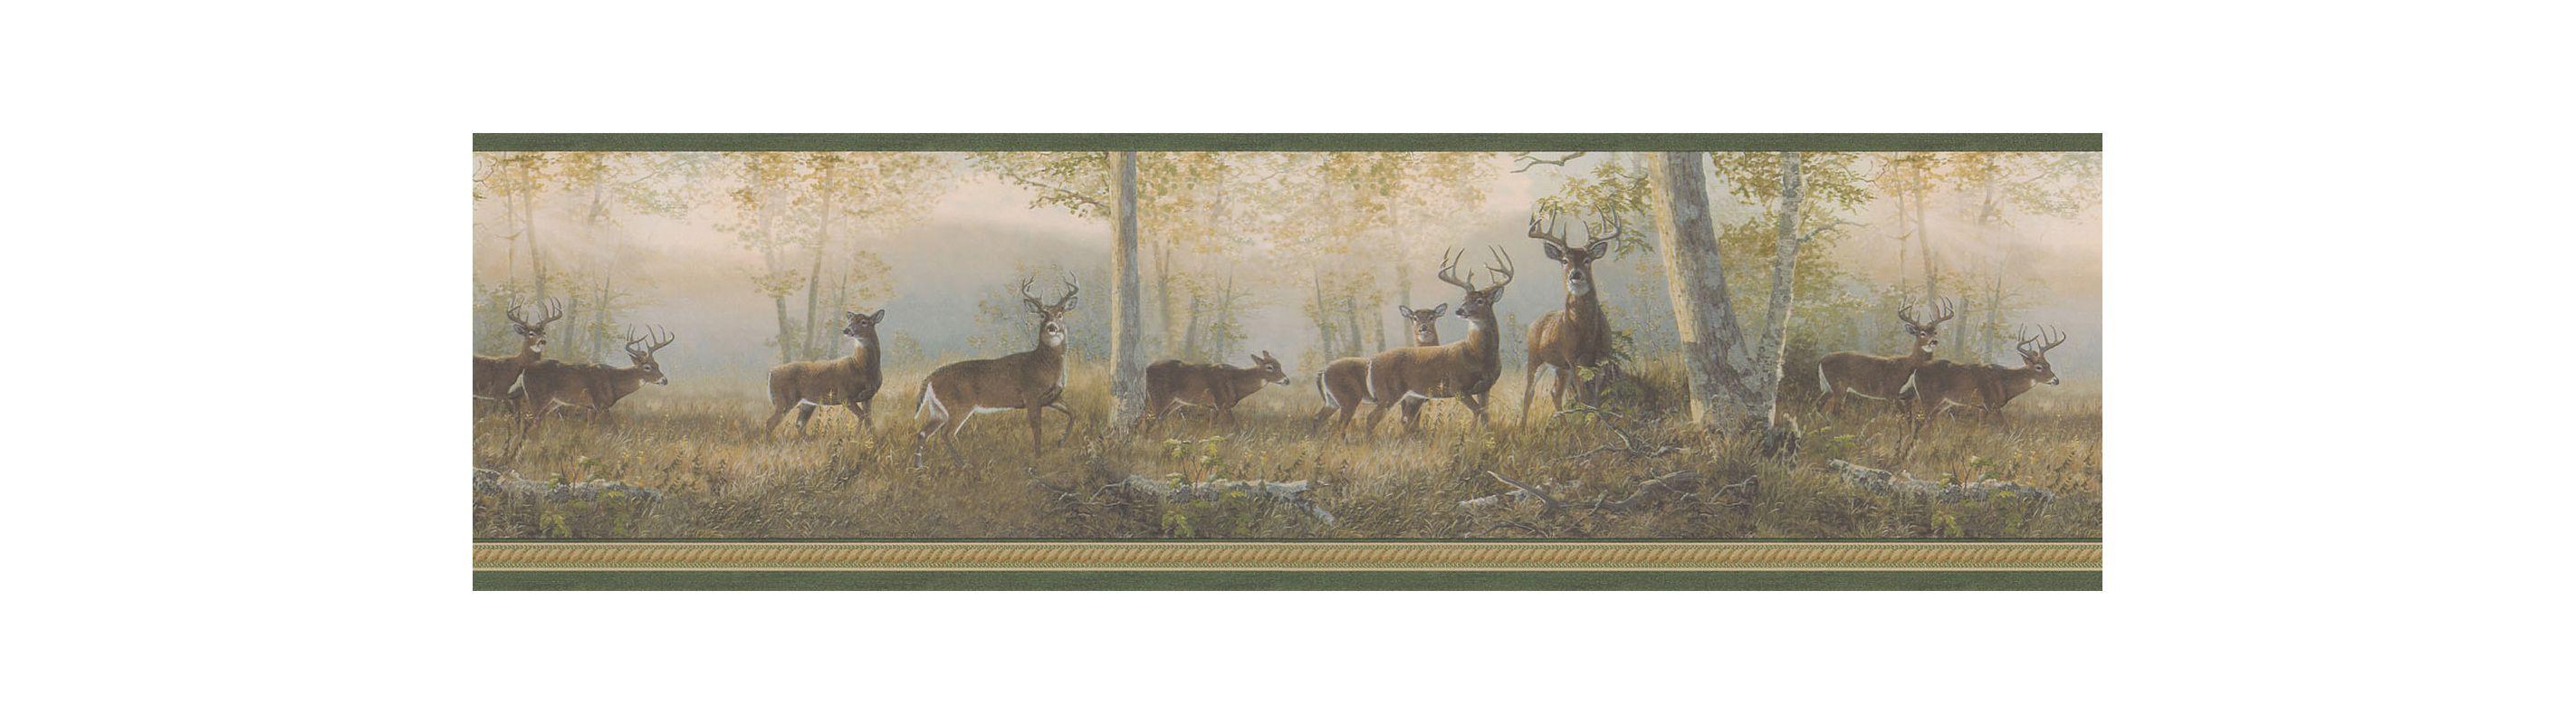 Brewster TLL44341 Storrie Green Deer Border Wallpaper Green Deer Home